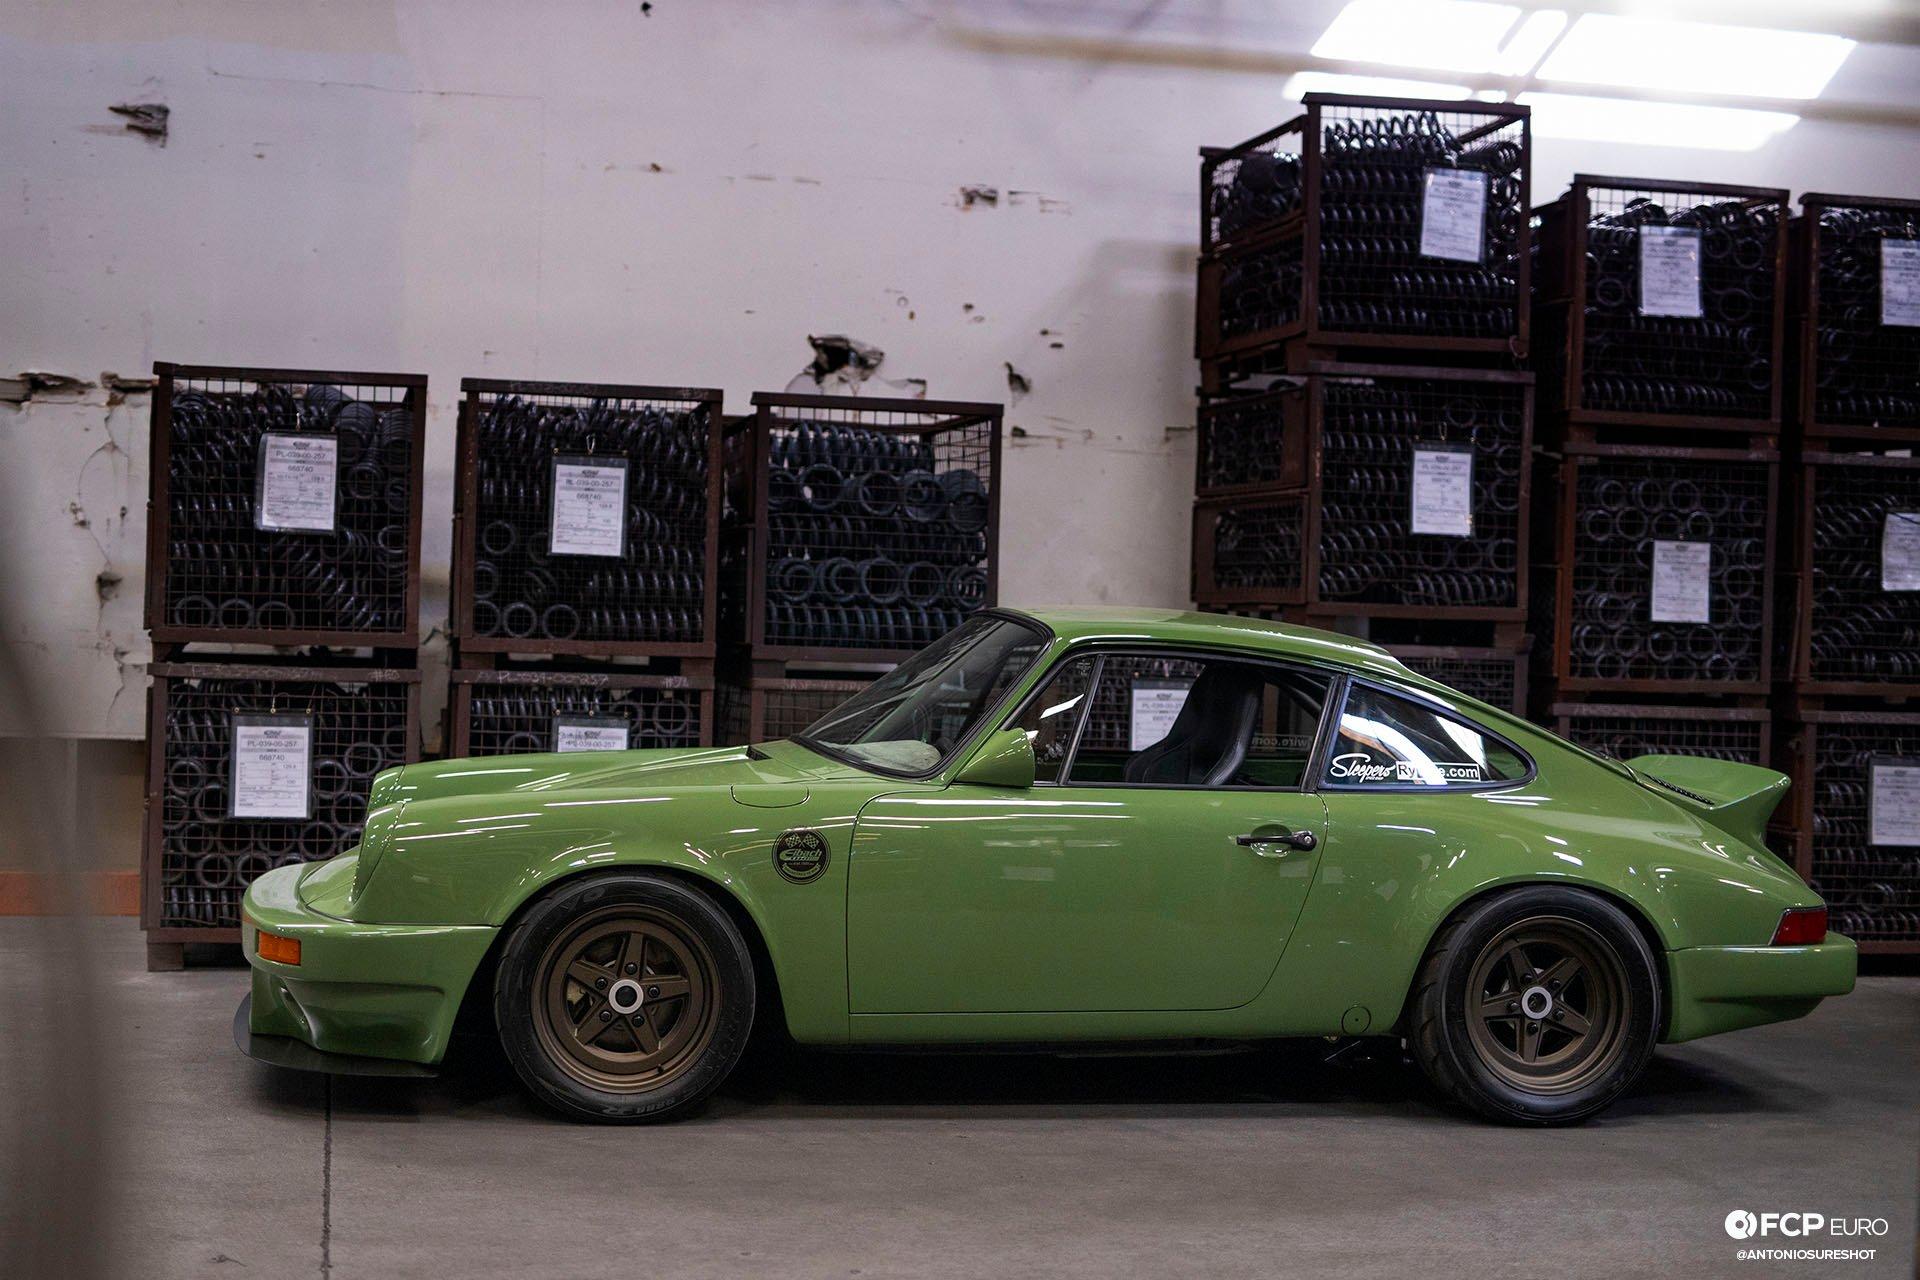 Ryan Hoegner 1982 930 911 SC Sleepers Eibach Borla AEM Sparco Fifteen52 Outlaw 003 EOSR9685